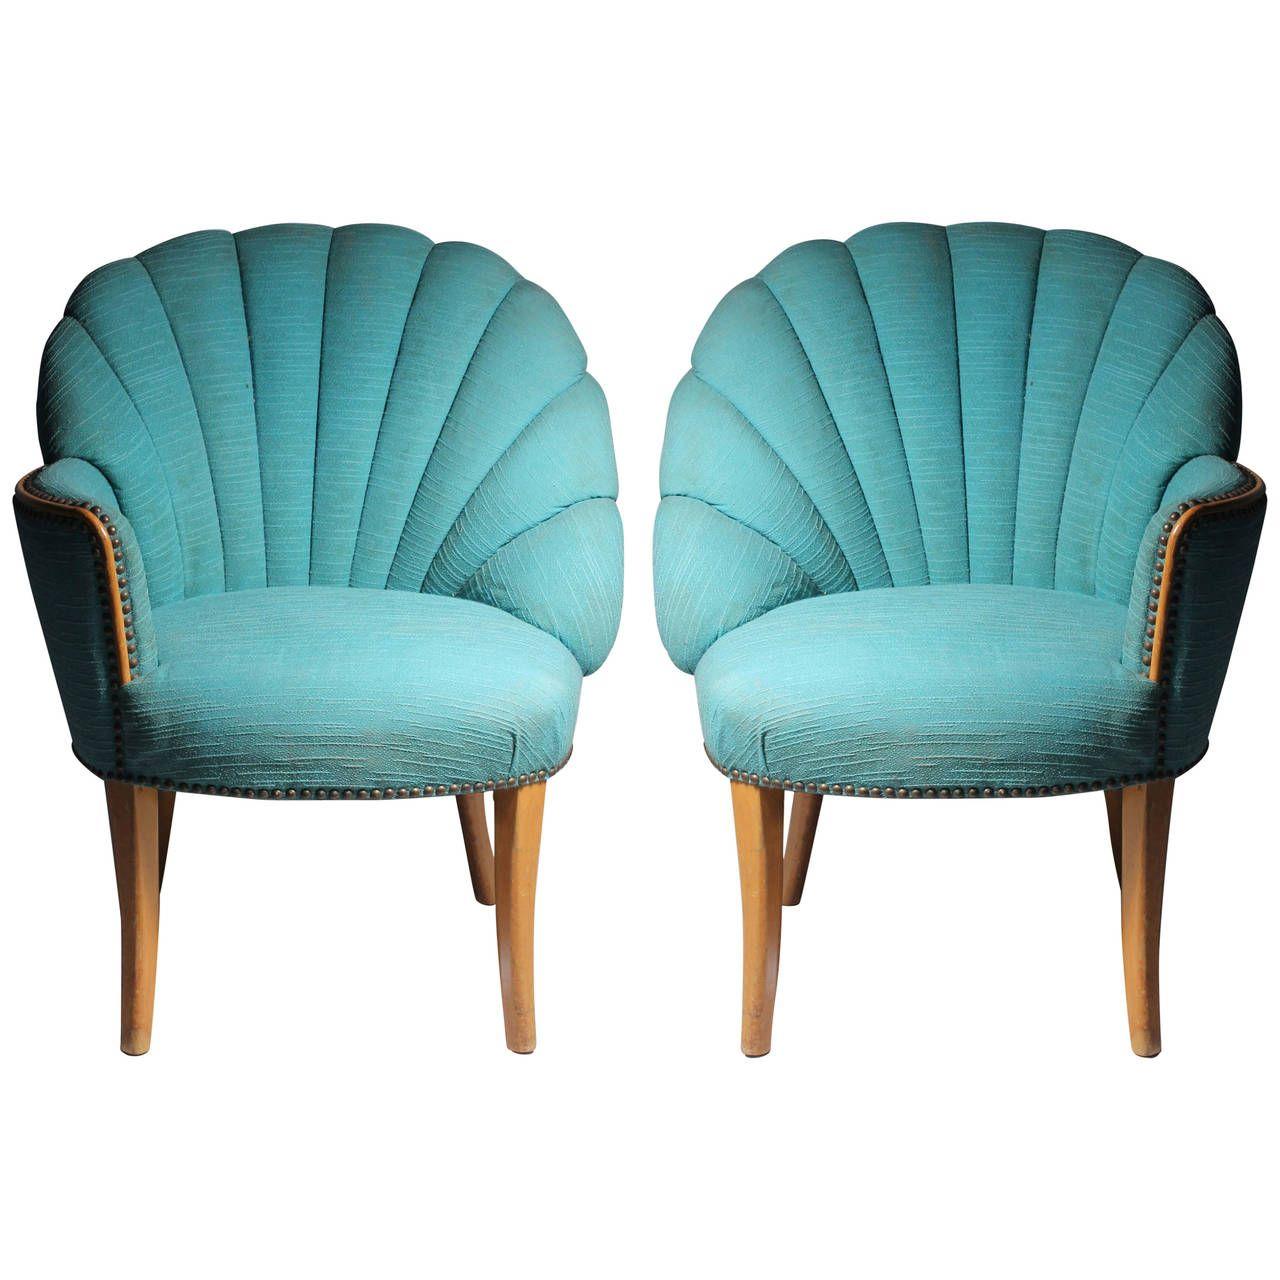 Vintage Asymmetrical Hollywood Regency FanBack Chairs